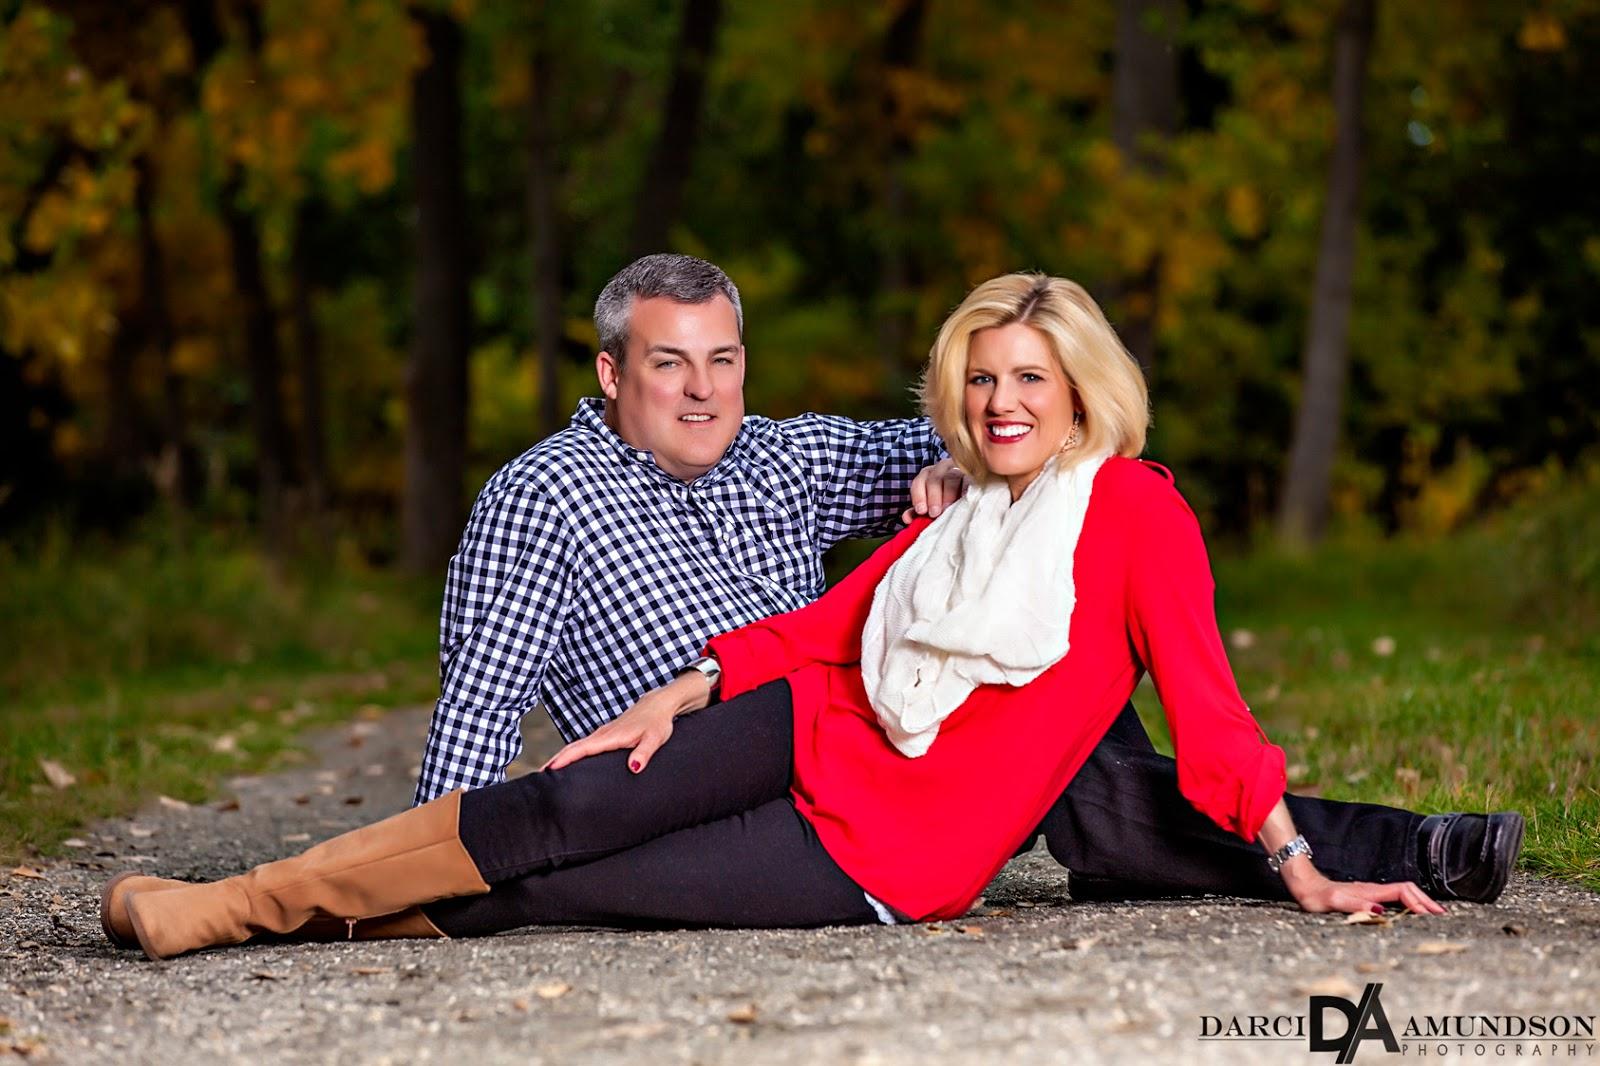 Nicole & Noel McGarvey | Fall Family Photographer Denver, CO | Darci ...